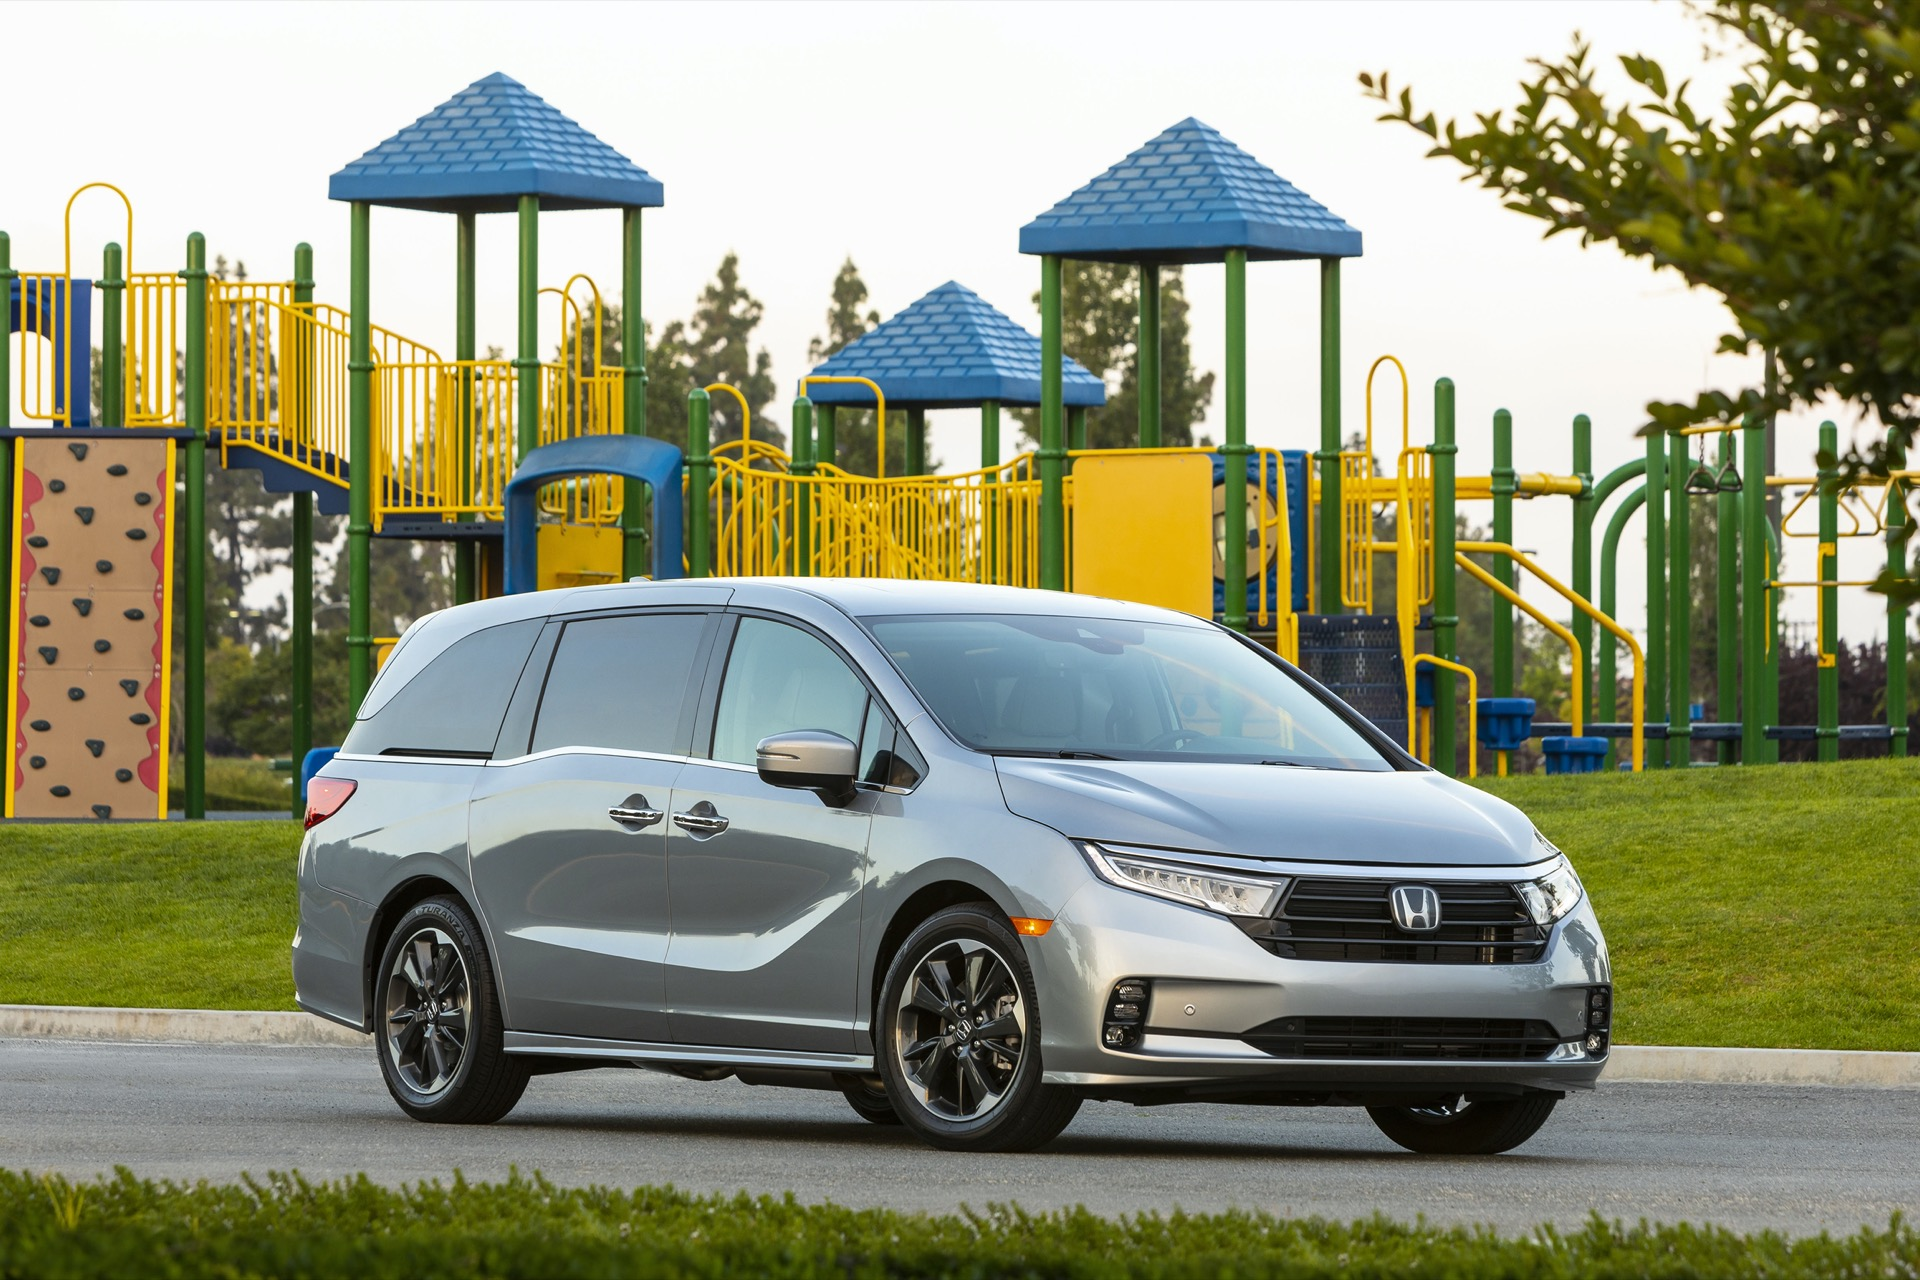 2021 honda odyssey minivan starts at 32910 touring trim